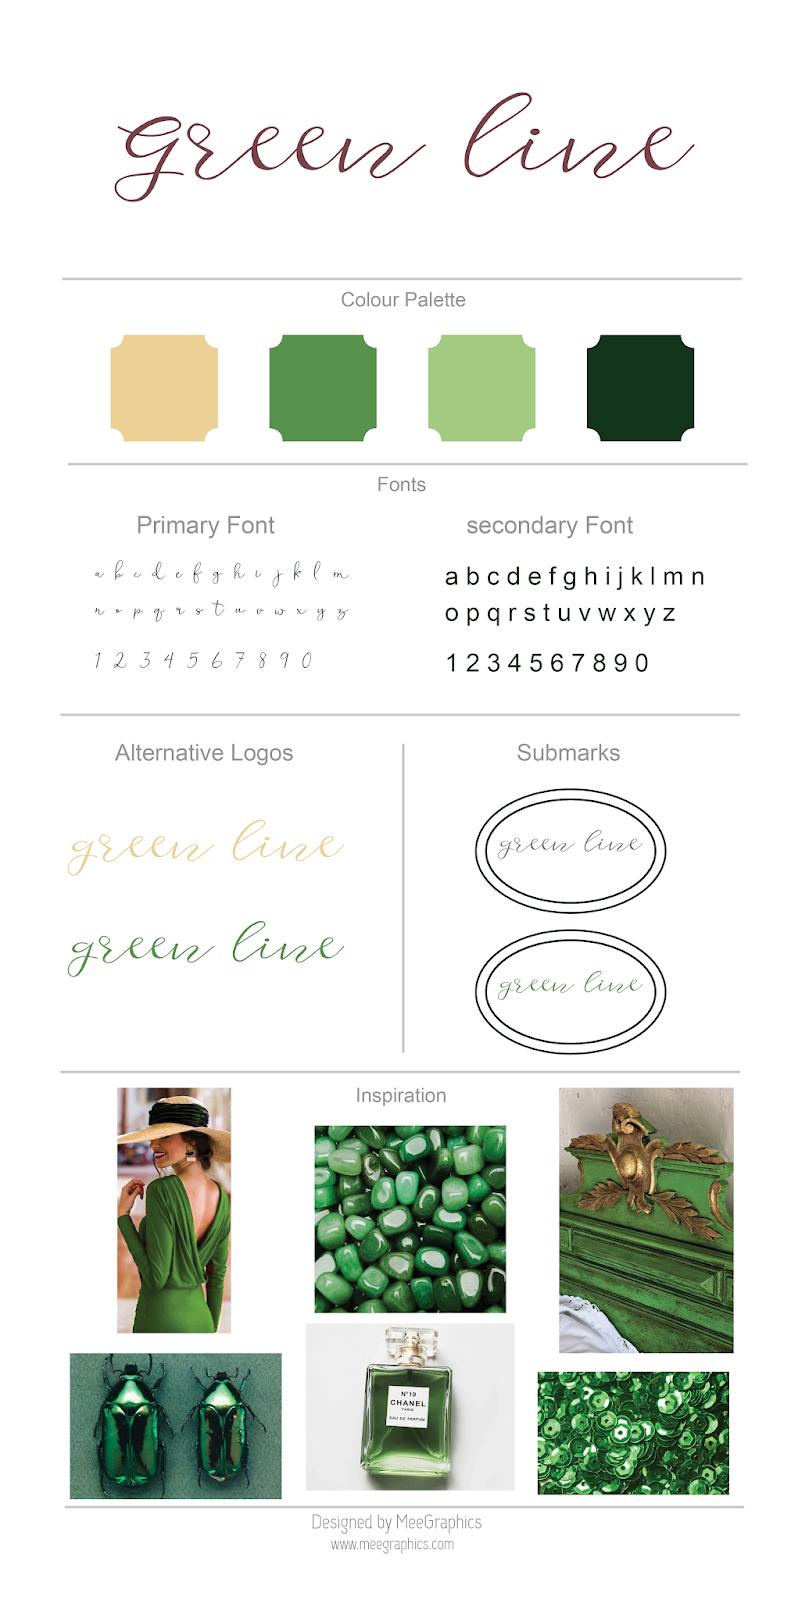 Brand Board Template | Meegraphics Green Line Brand Board Design Green Inspiration